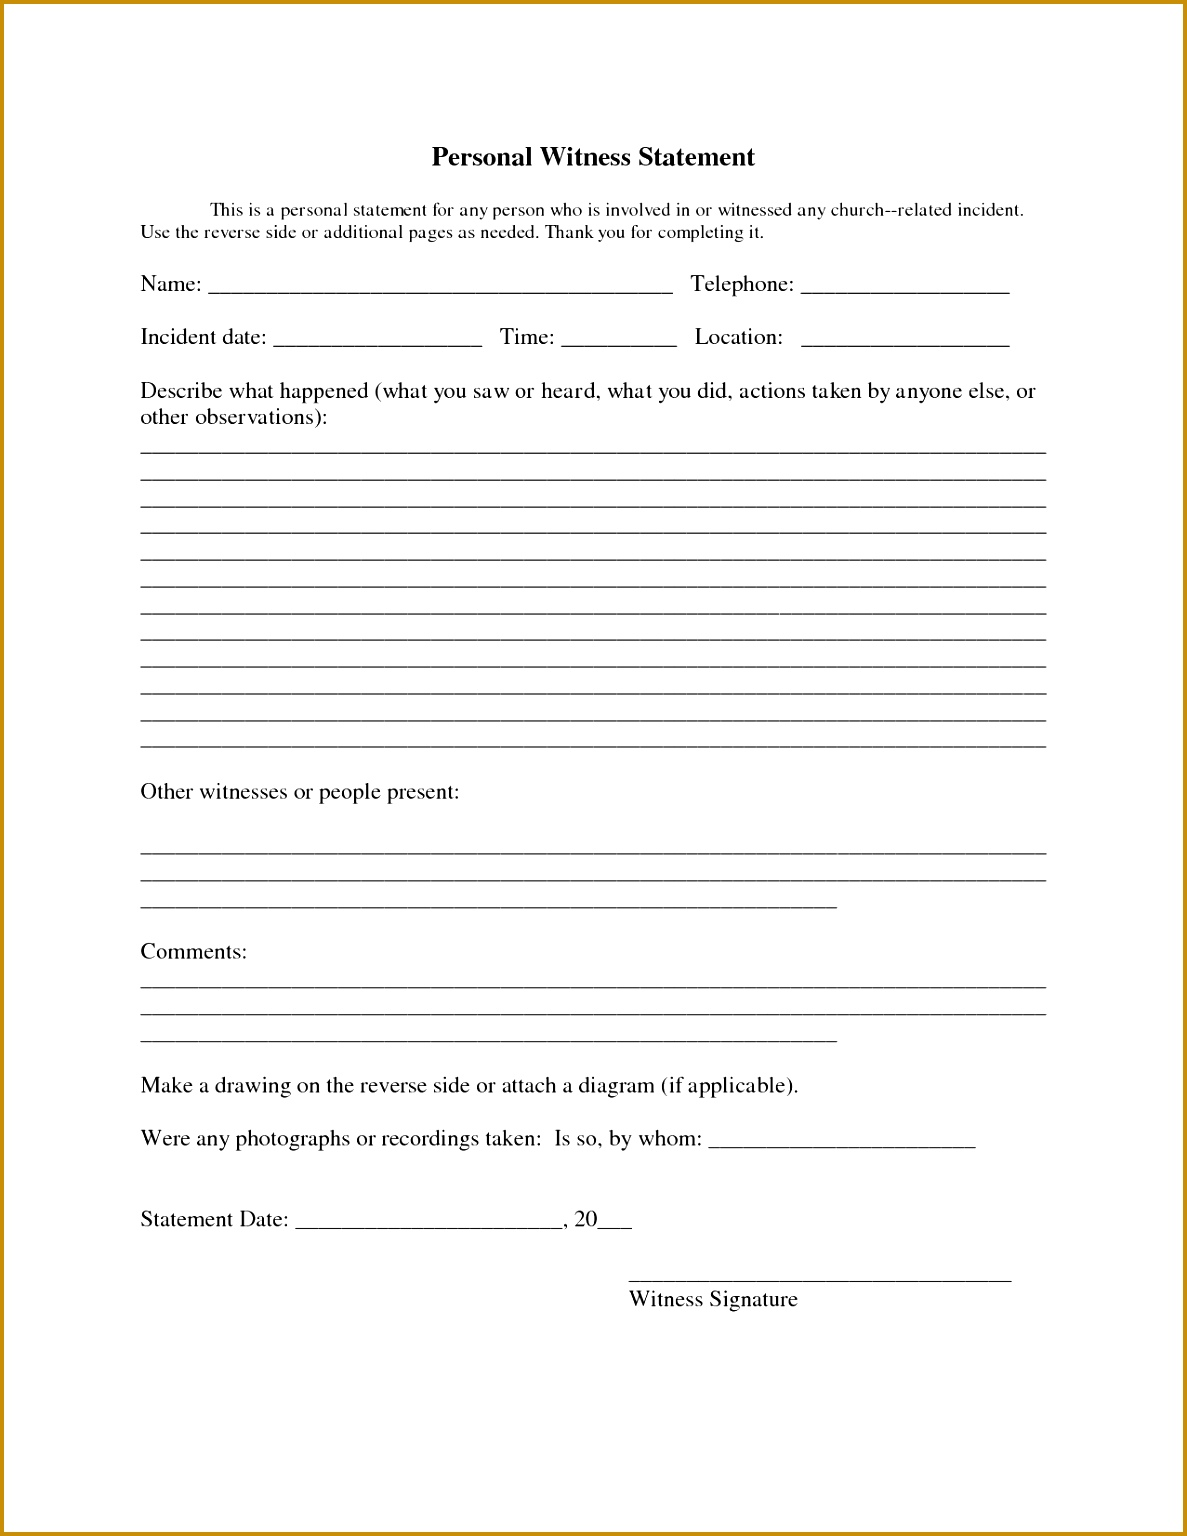 Witness Statement Sample 11871536